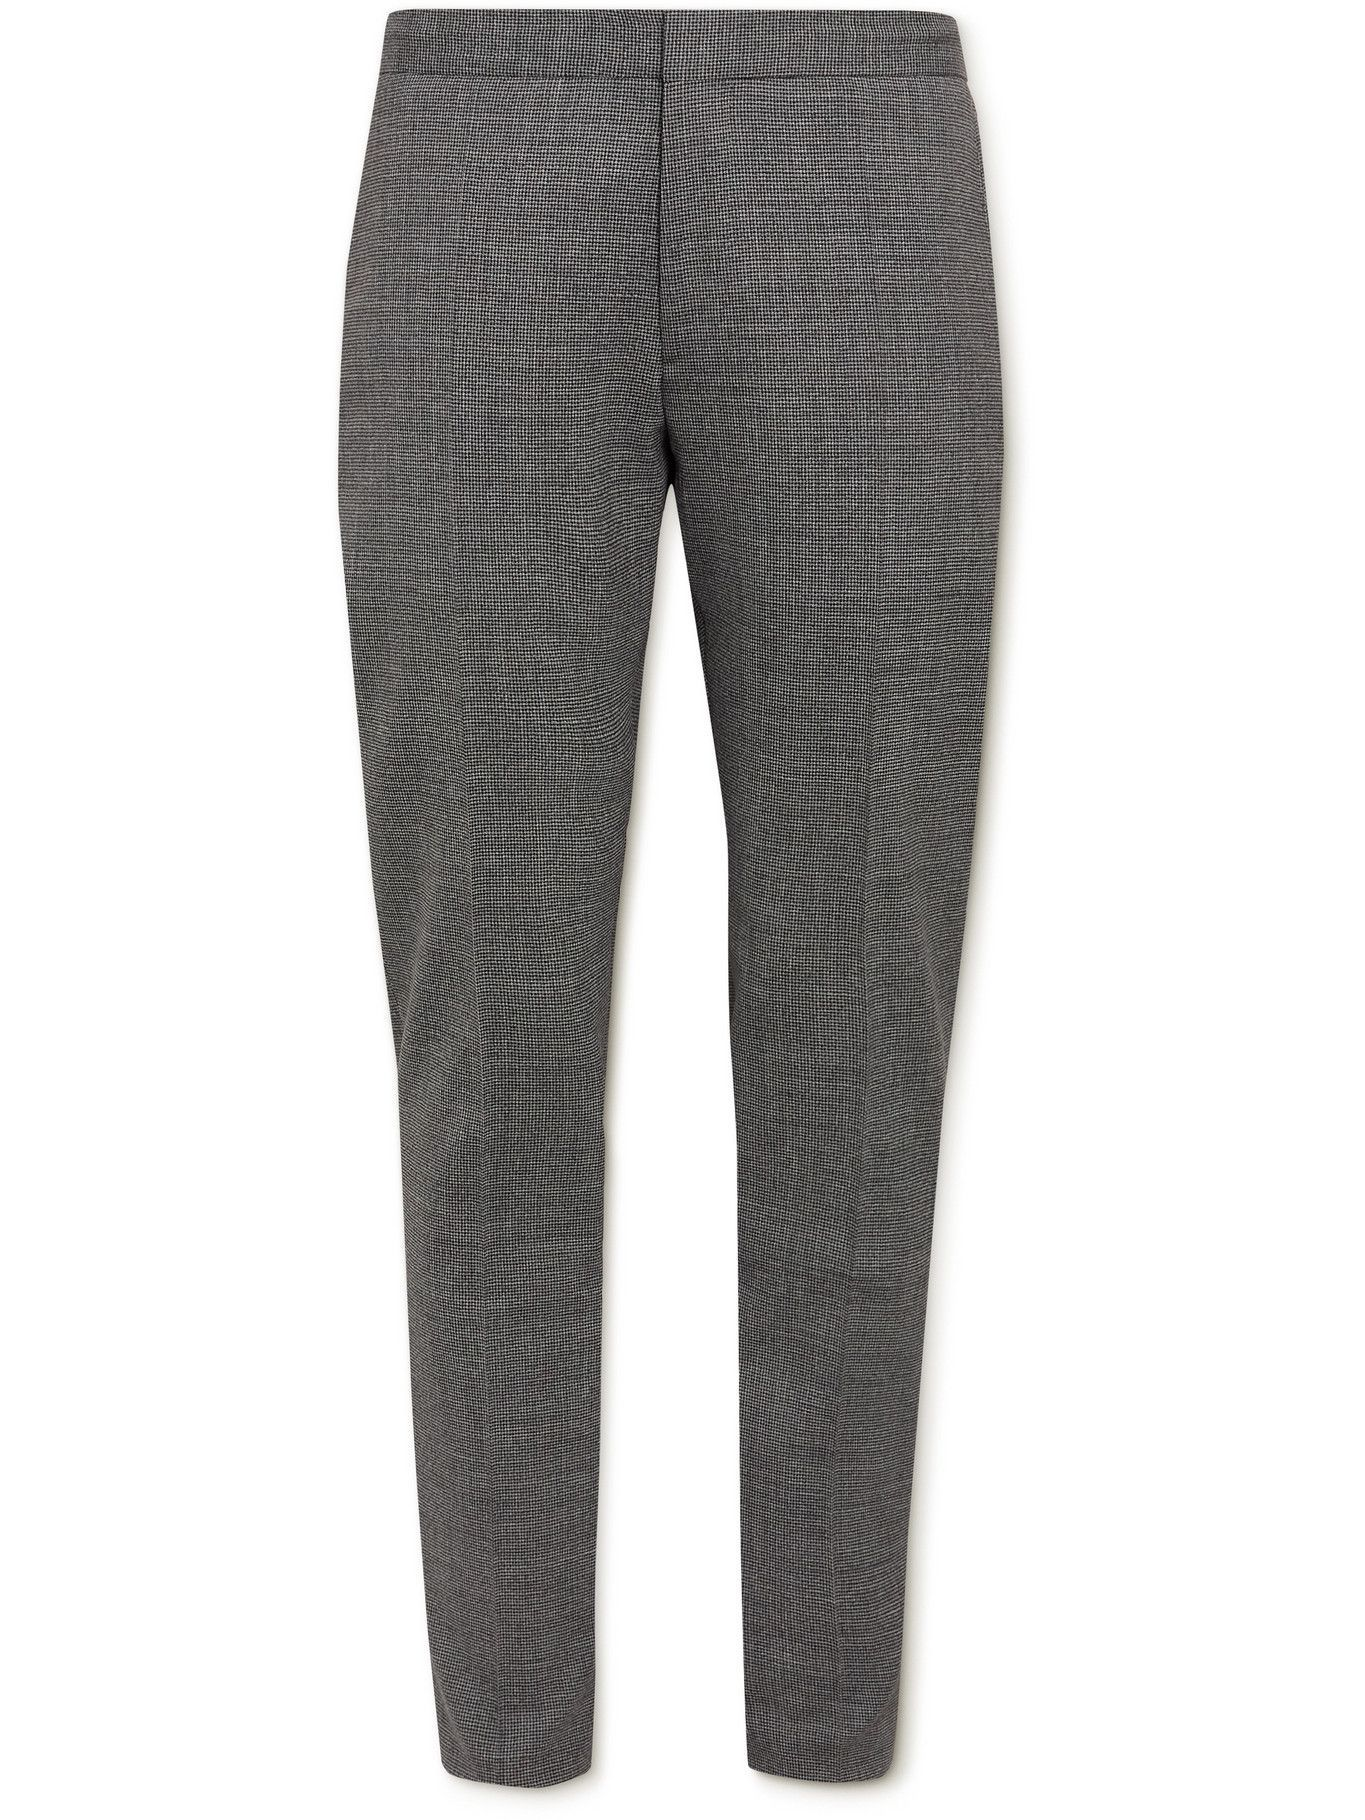 Photo: HUGO BOSS - Slim-Fit Puppytooth Stretch Virgin Wool Trousers - Gray